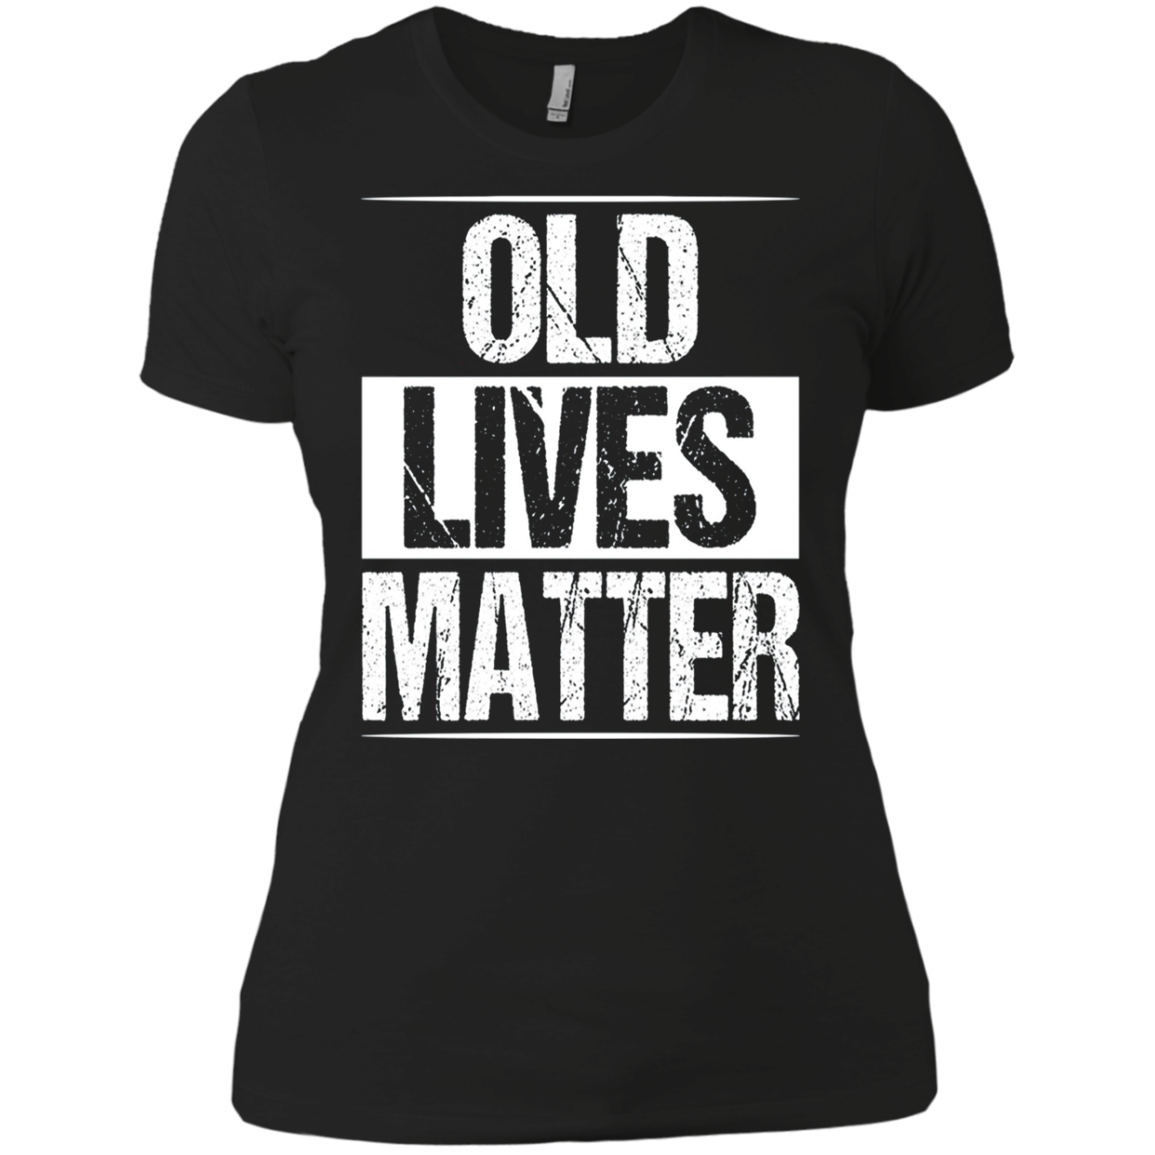 60th Birthday Gifts For Men Old Lives Matter Shirt 50th Dad Ladies' Boyfriend shirt Men